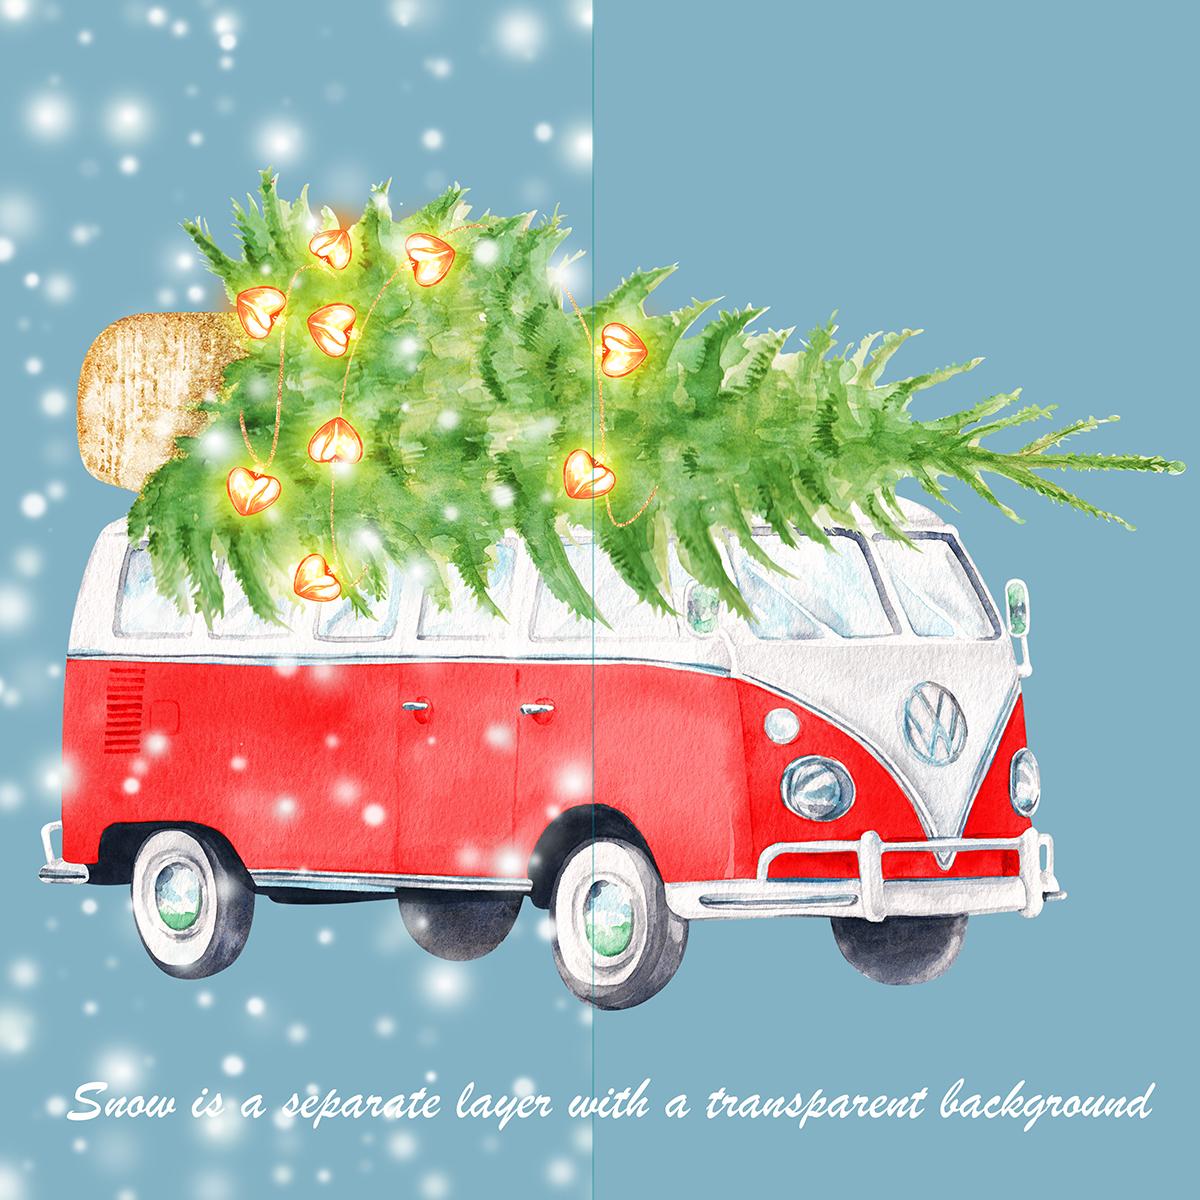 Christmas retro van cliparts. example image 3